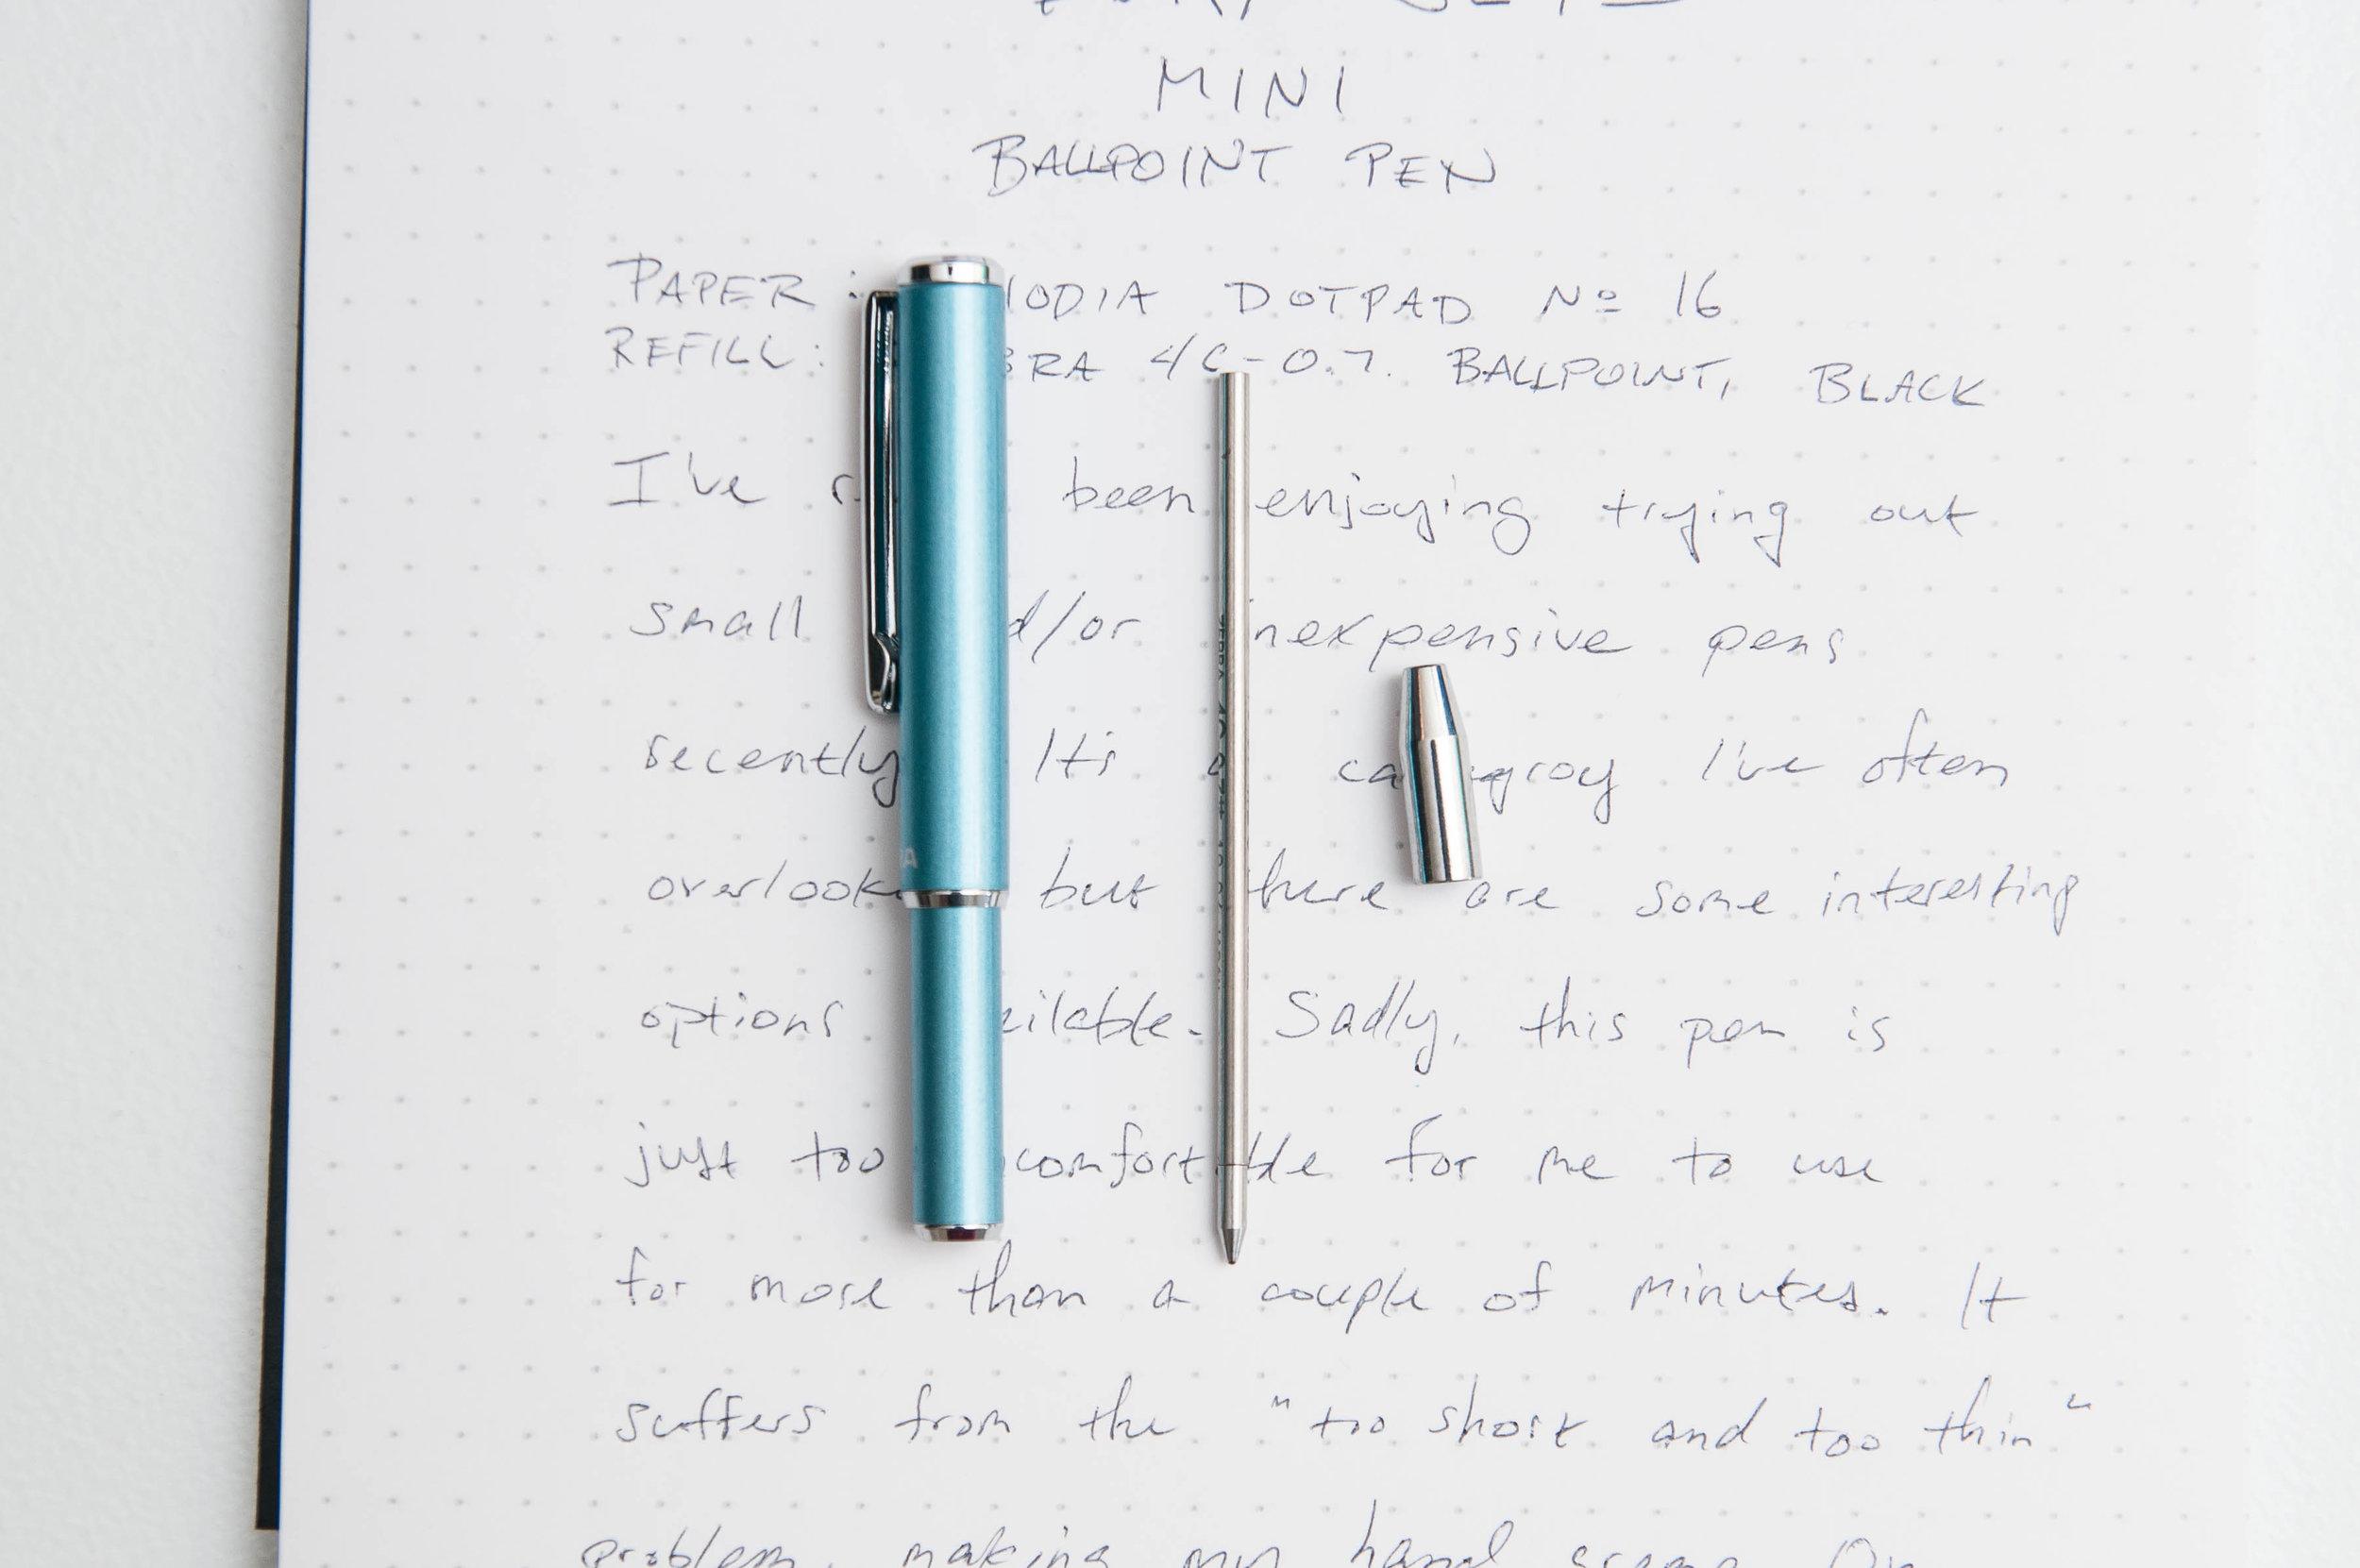 Zebra SL-F1 Mini Ballpoint Pen D1 Refill